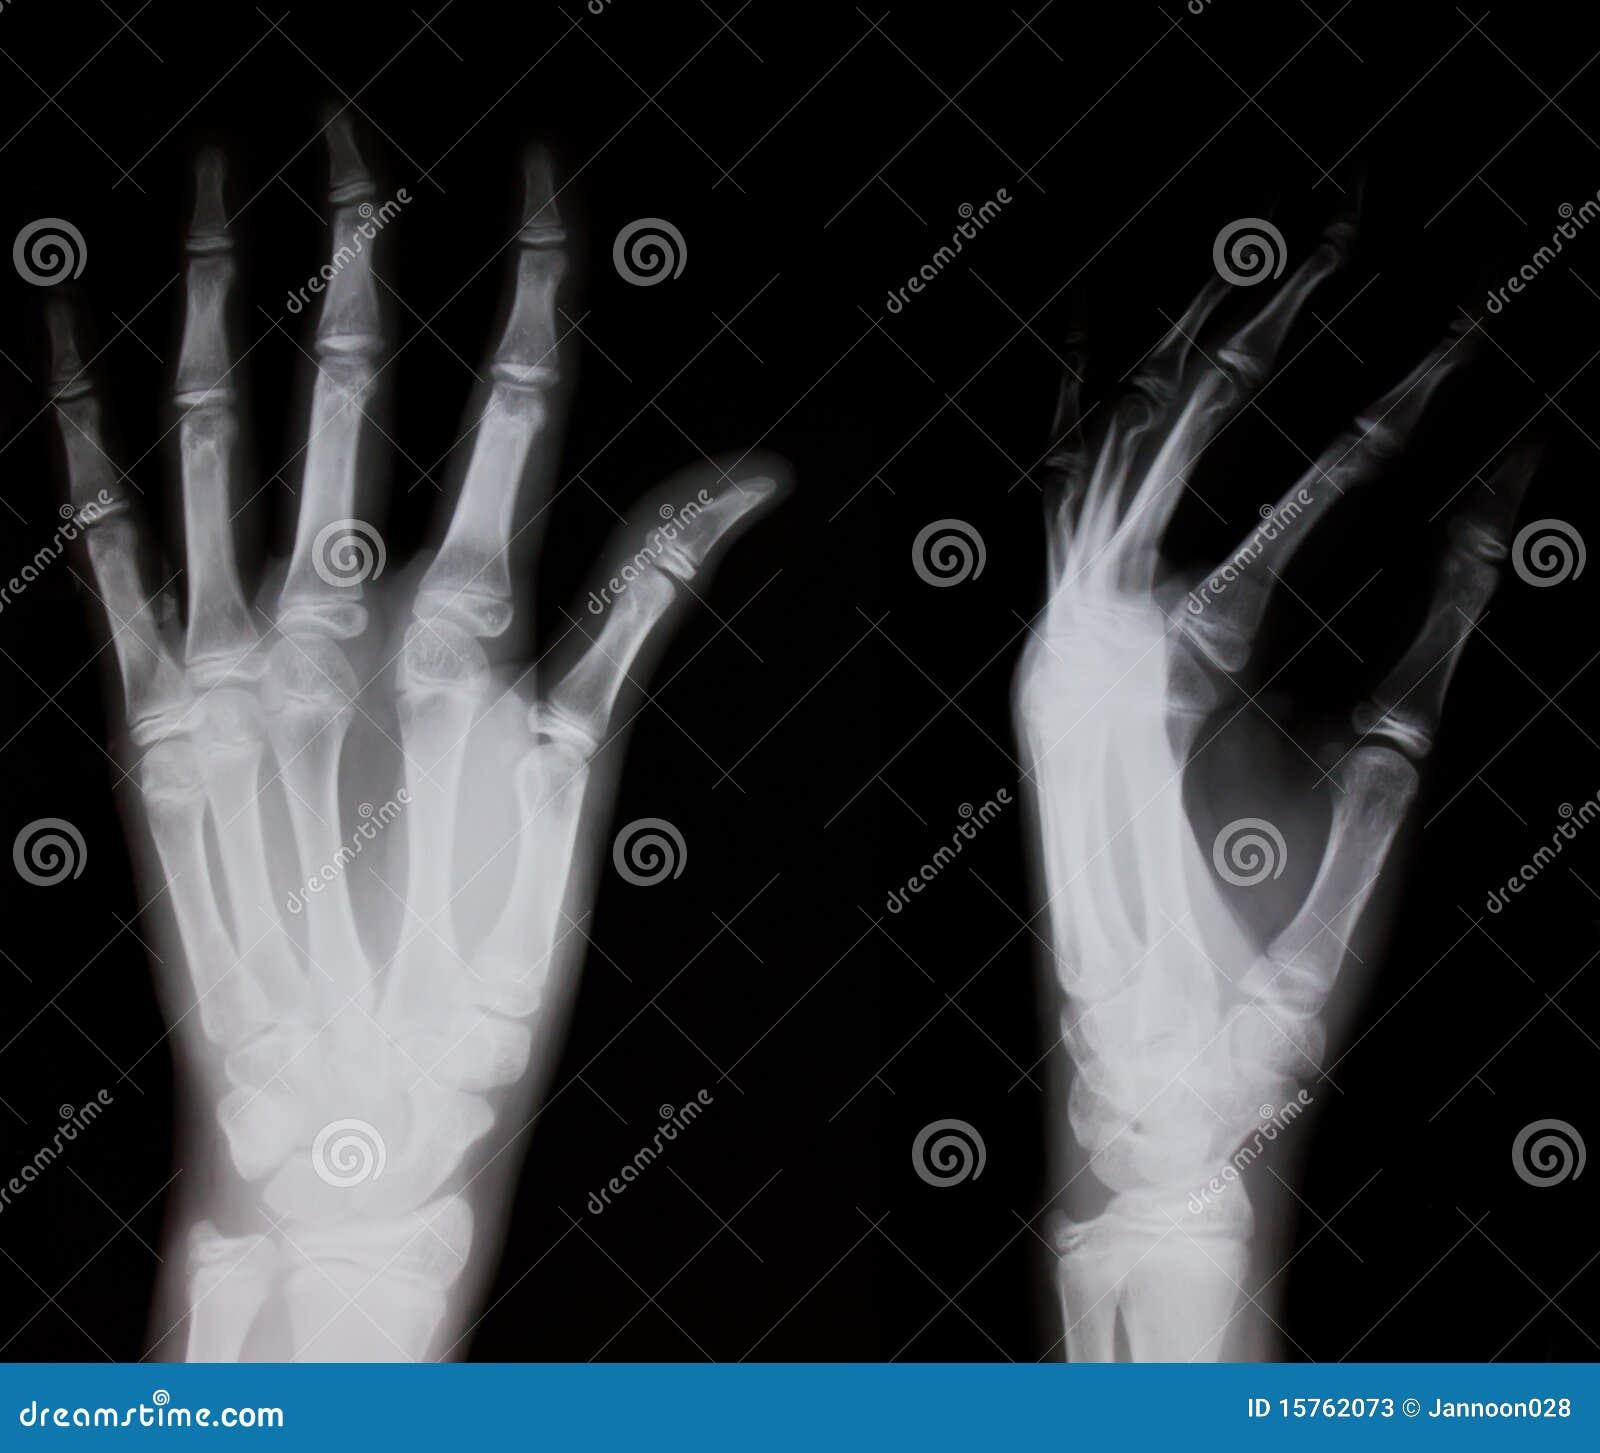 xray of human hand royaltyfree stock image